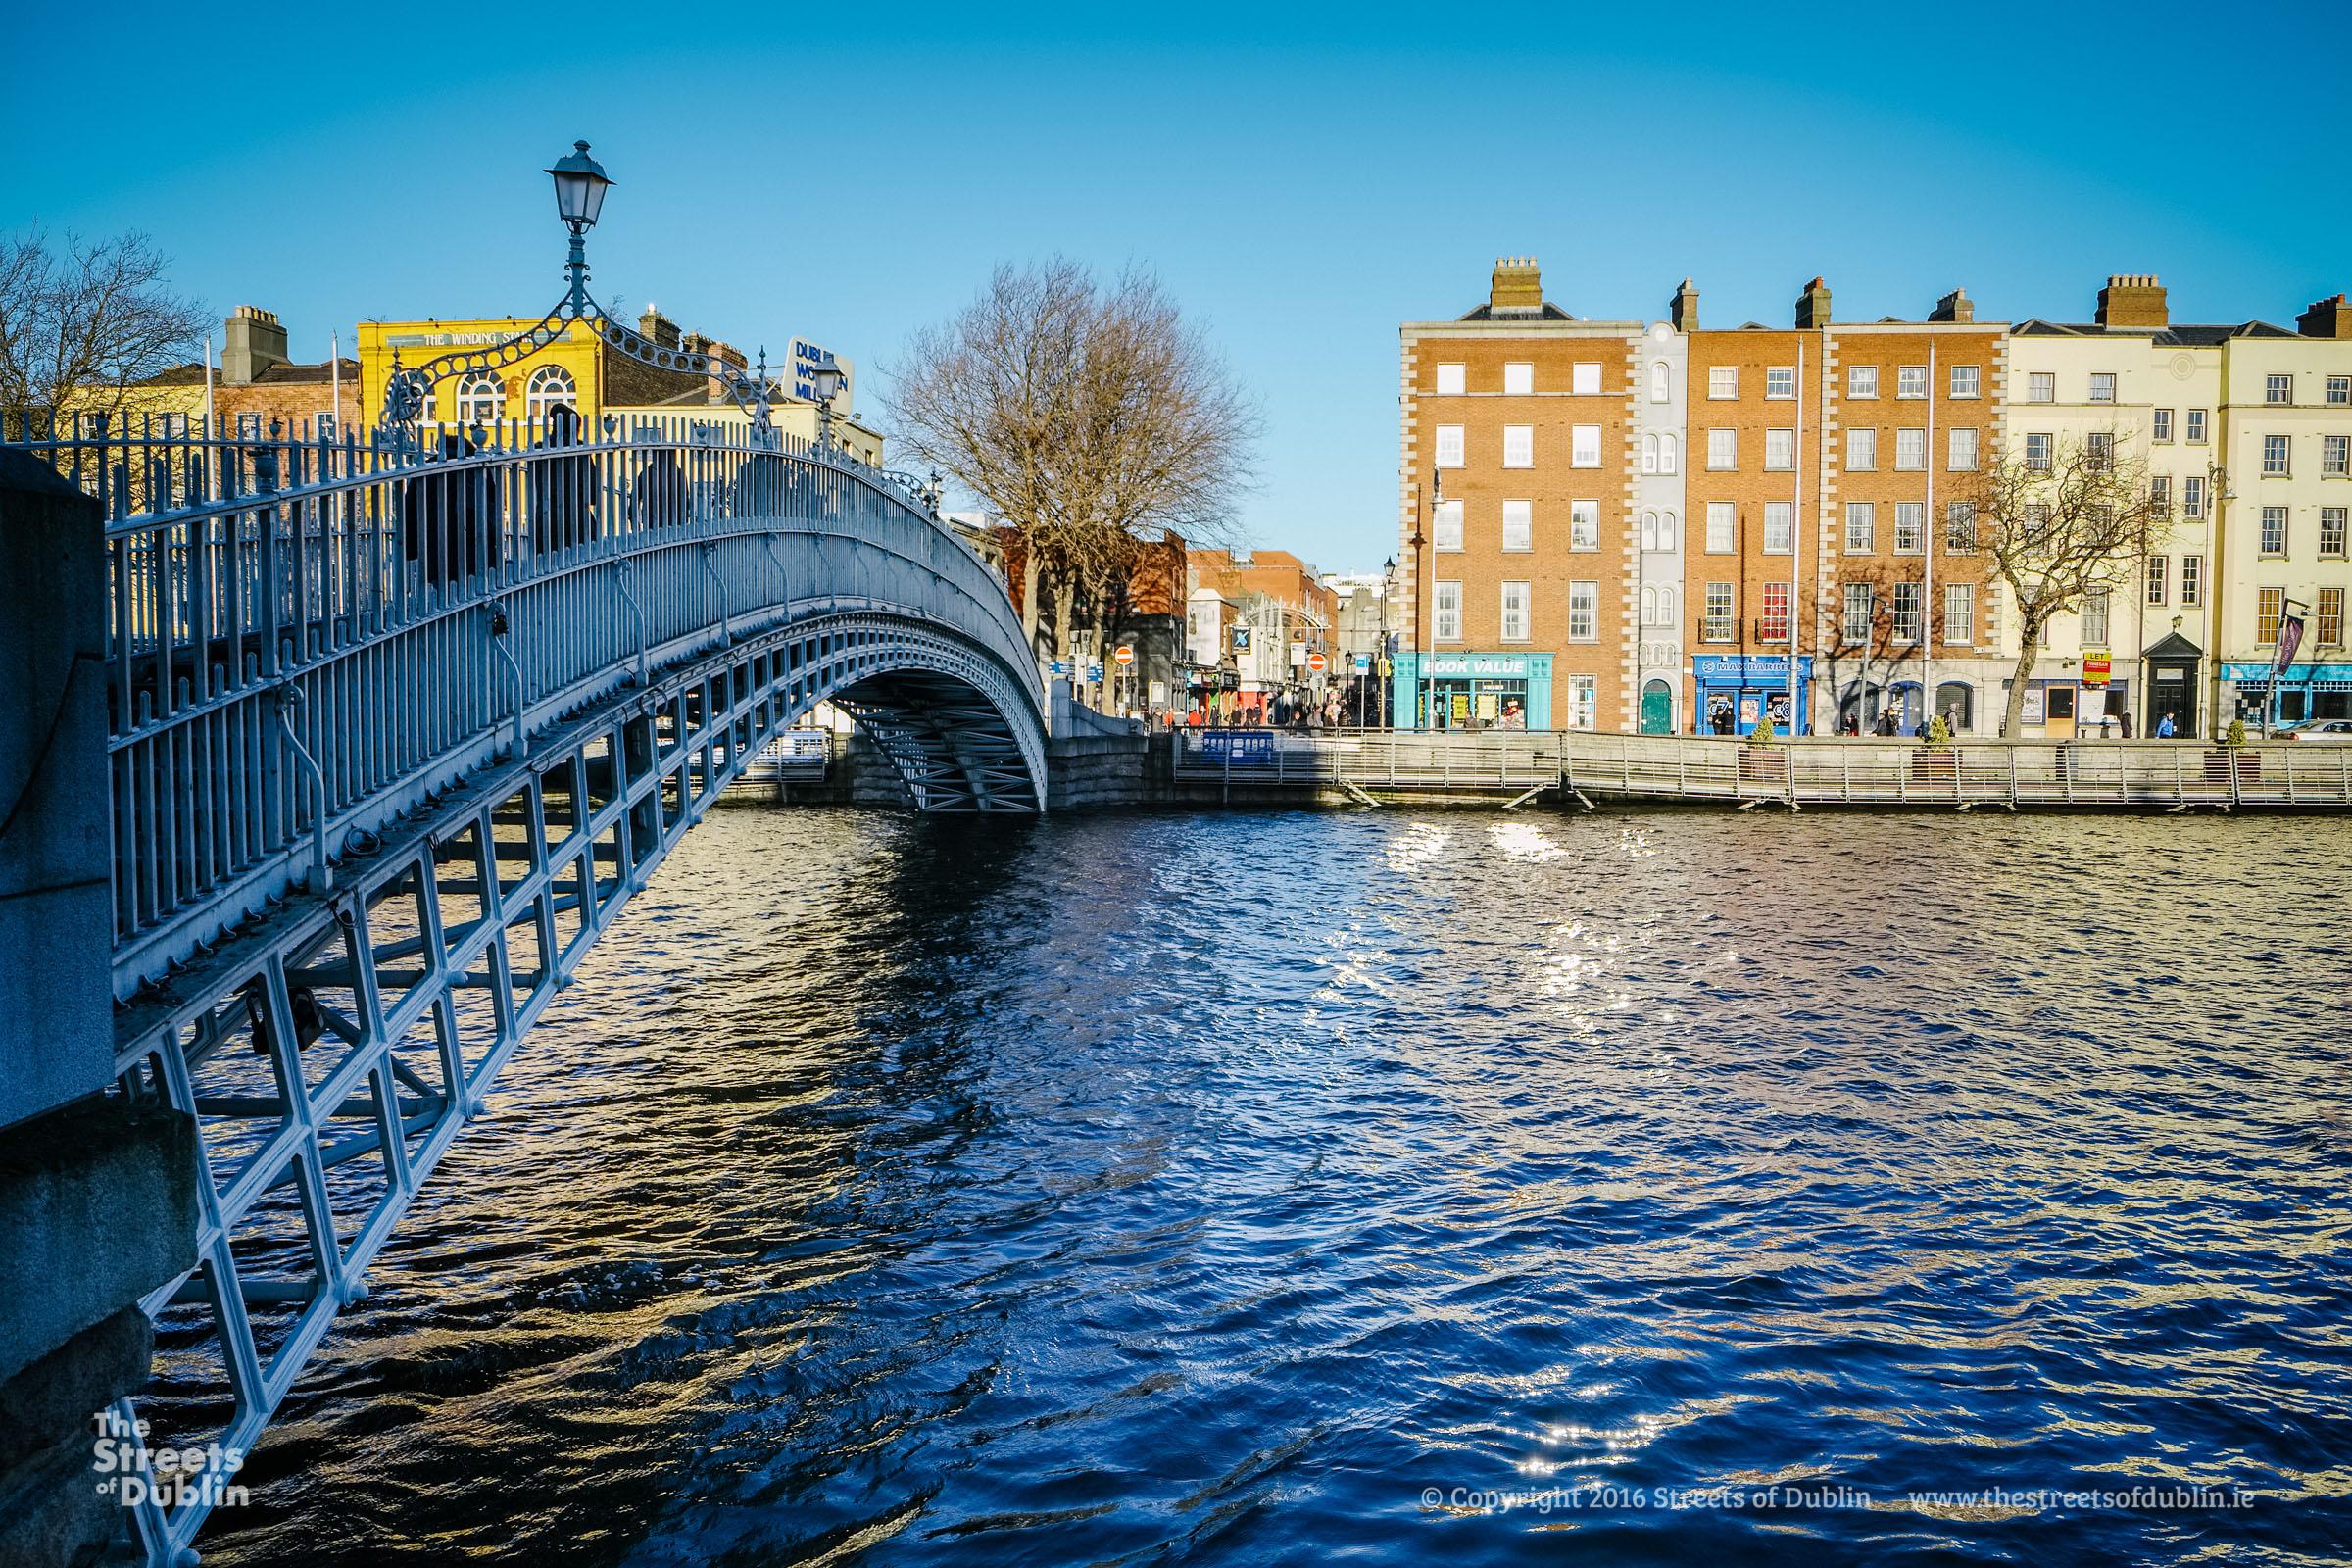 Streets-of-Dublin-Photo-2-169.jpg